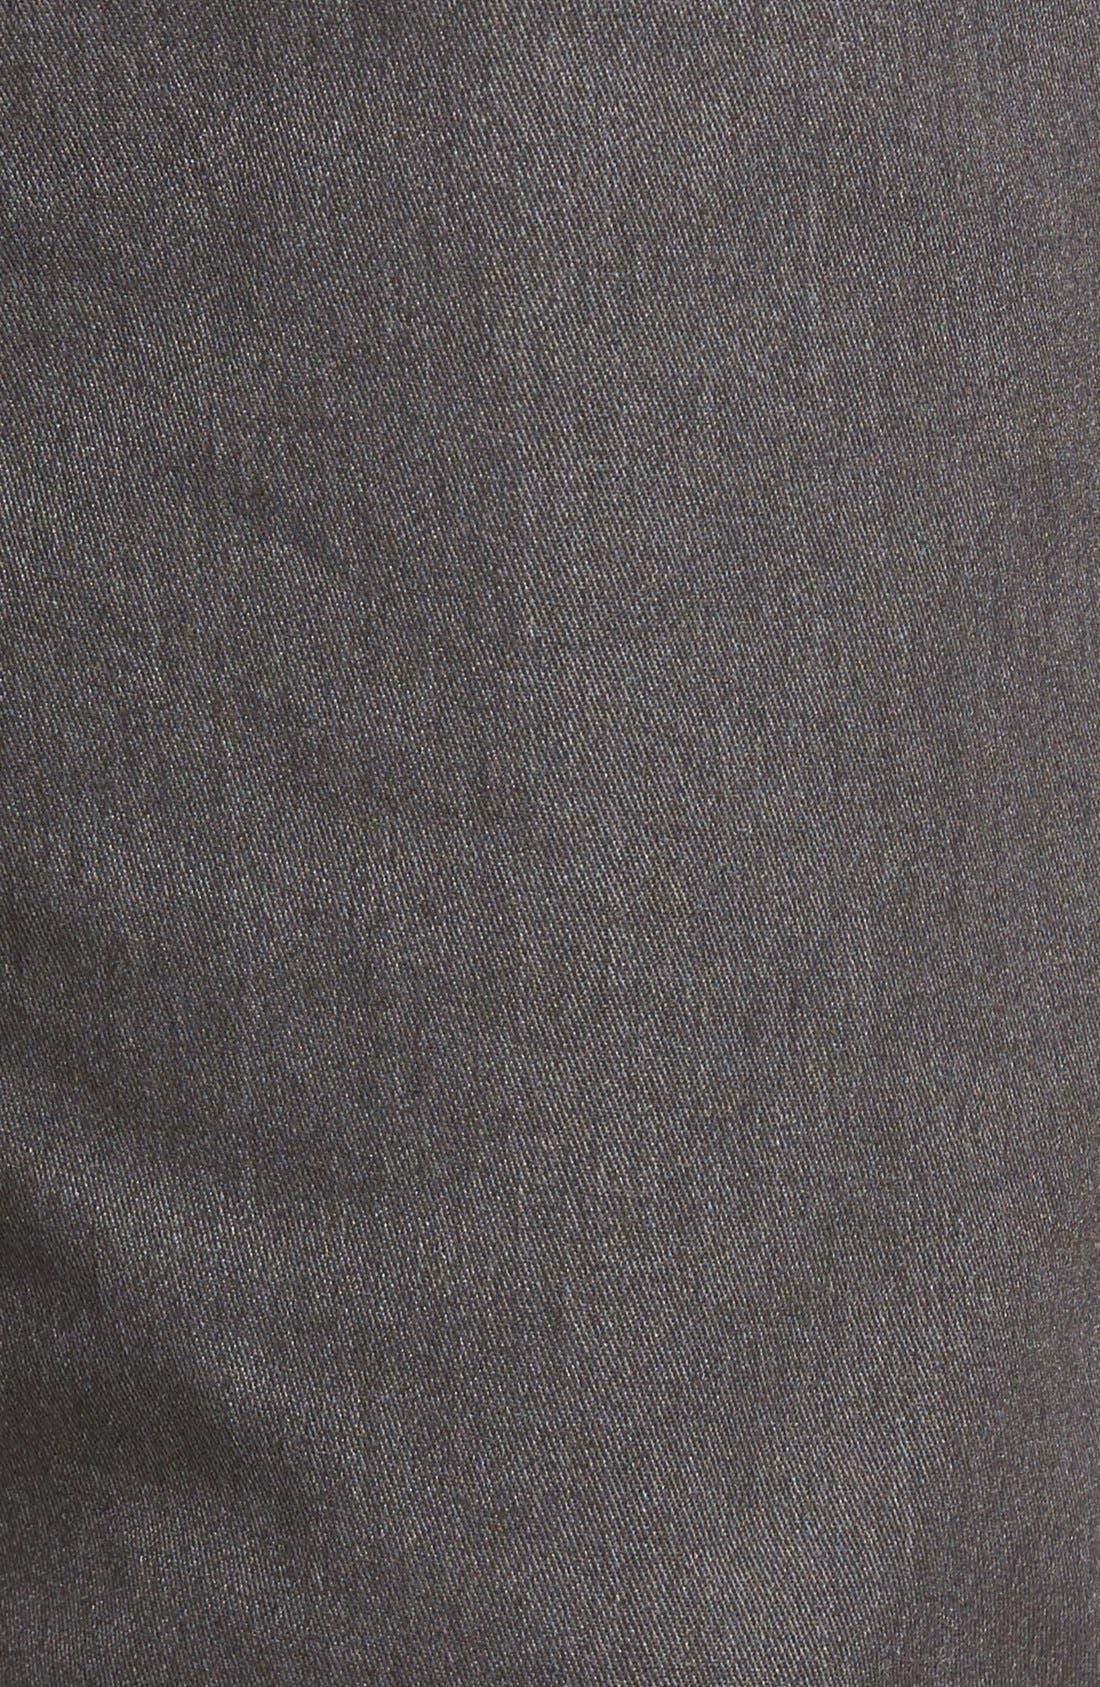 'Modern' Stretch Chino Shorts,                             Alternate thumbnail 5, color,                             030